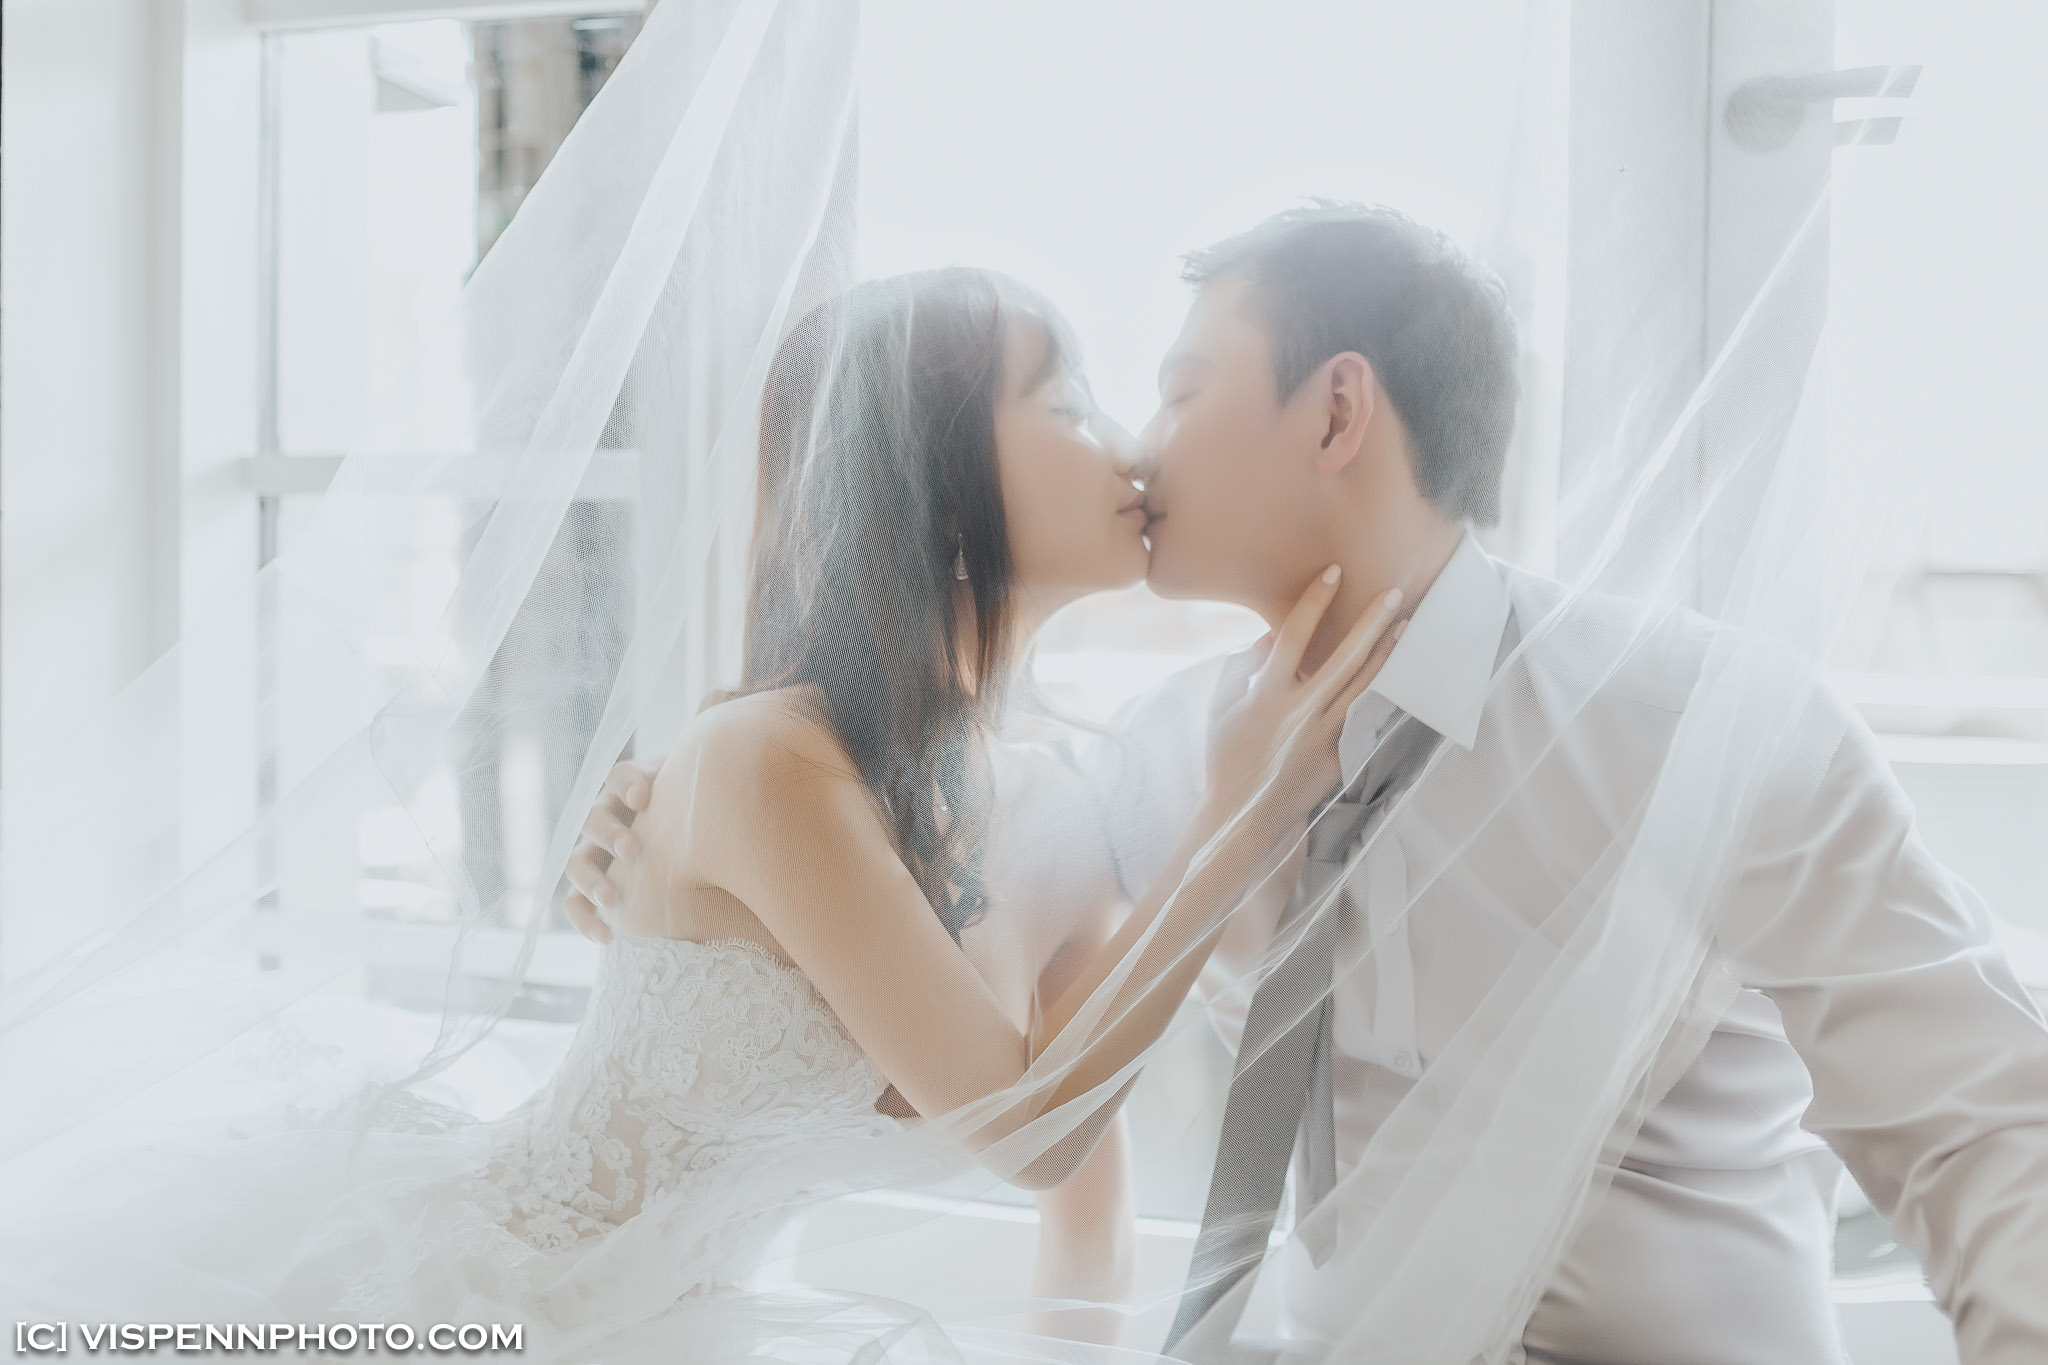 PRE WEDDING Photography Melbourne VISPENN 墨尔本 婚纱照 结婚照 婚纱摄影 VISPENN ThomasWangPreWedding 0242